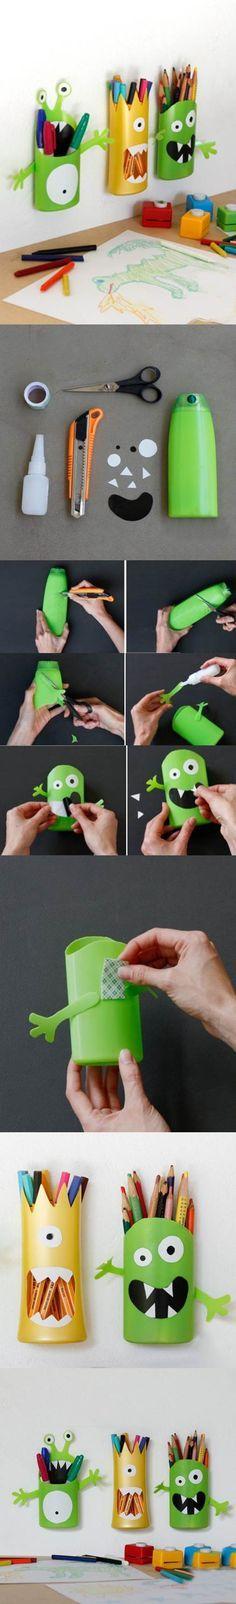 DIY Funny Pen Holder from Plastic Bottle | iCreativeIdeas.com Like Us on Facebook ==> https://www.facebook.com/icreativeideas